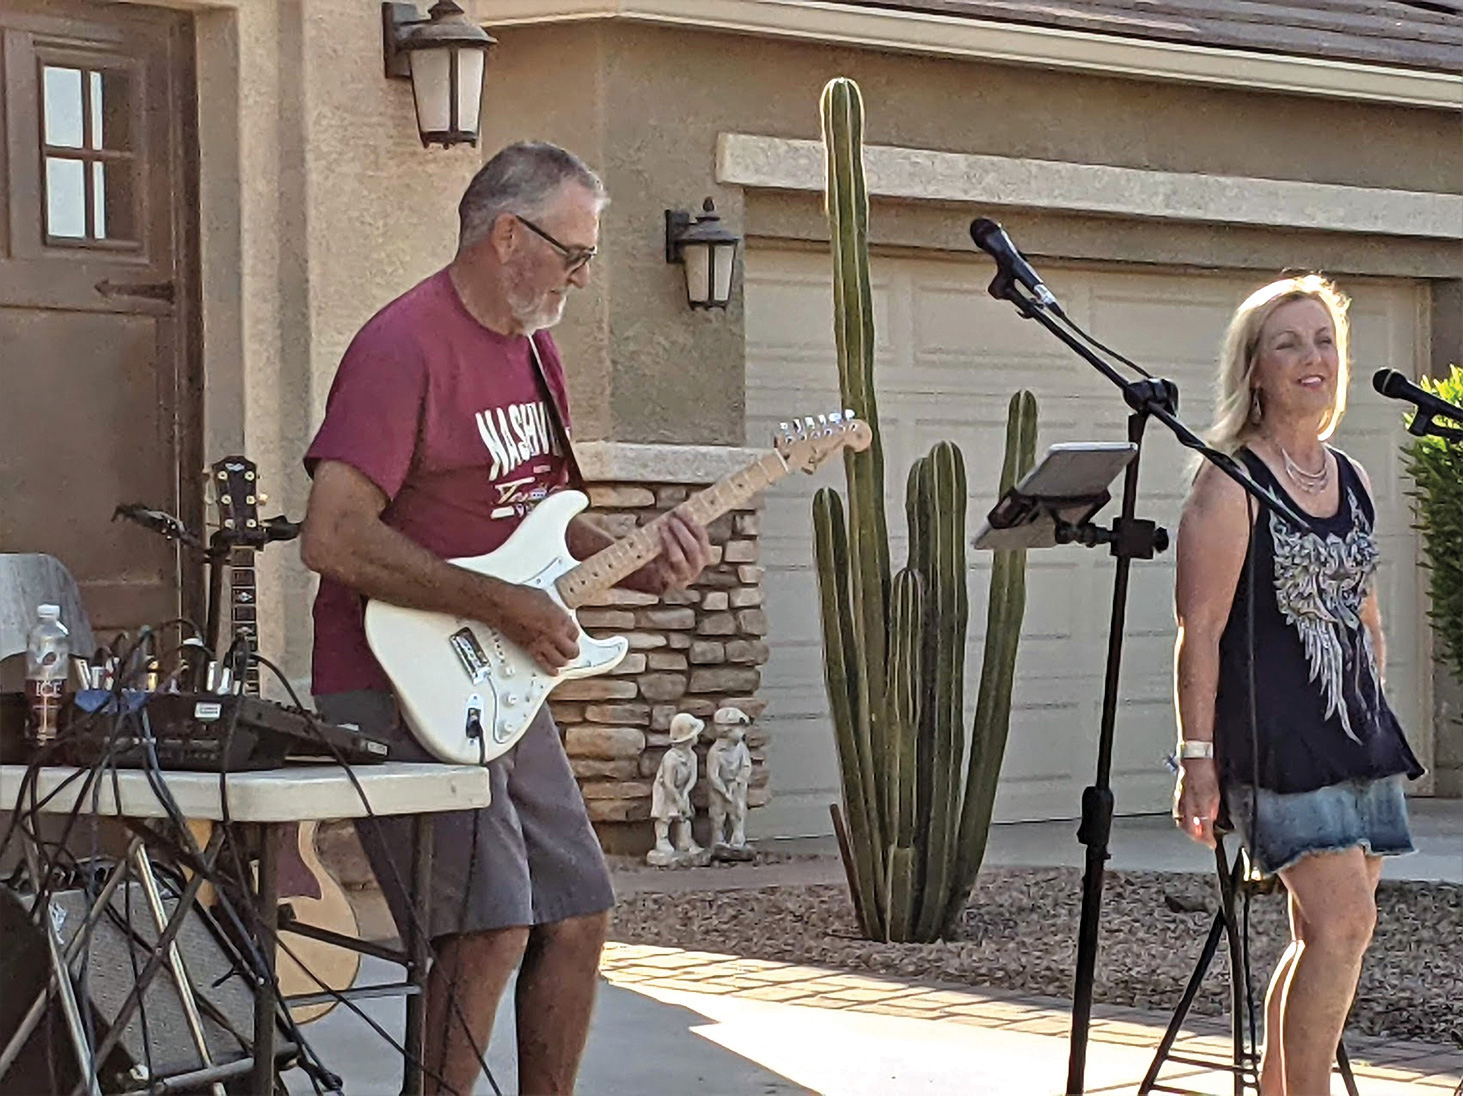 Sierra Sound musicians Ken Muhlbeier and Kim Gibbs